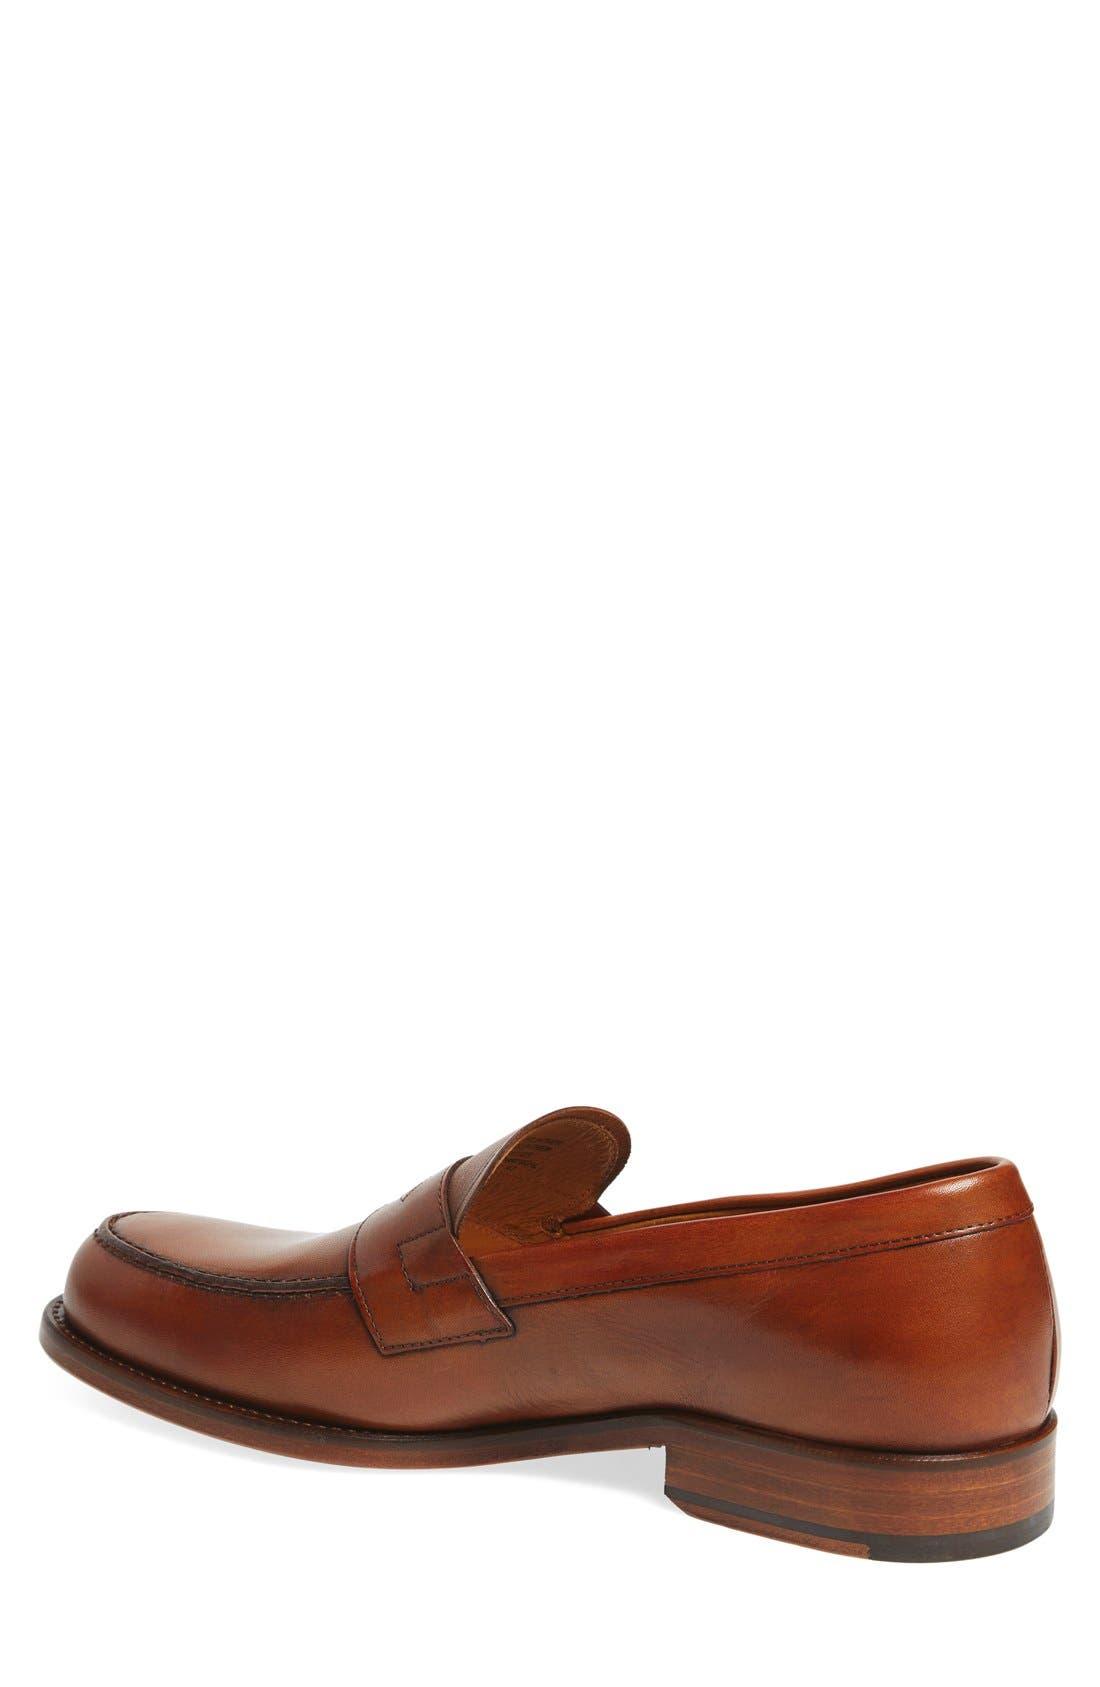 'Nacher' Loafer,                             Alternate thumbnail 2, color,                             Cognac Leather